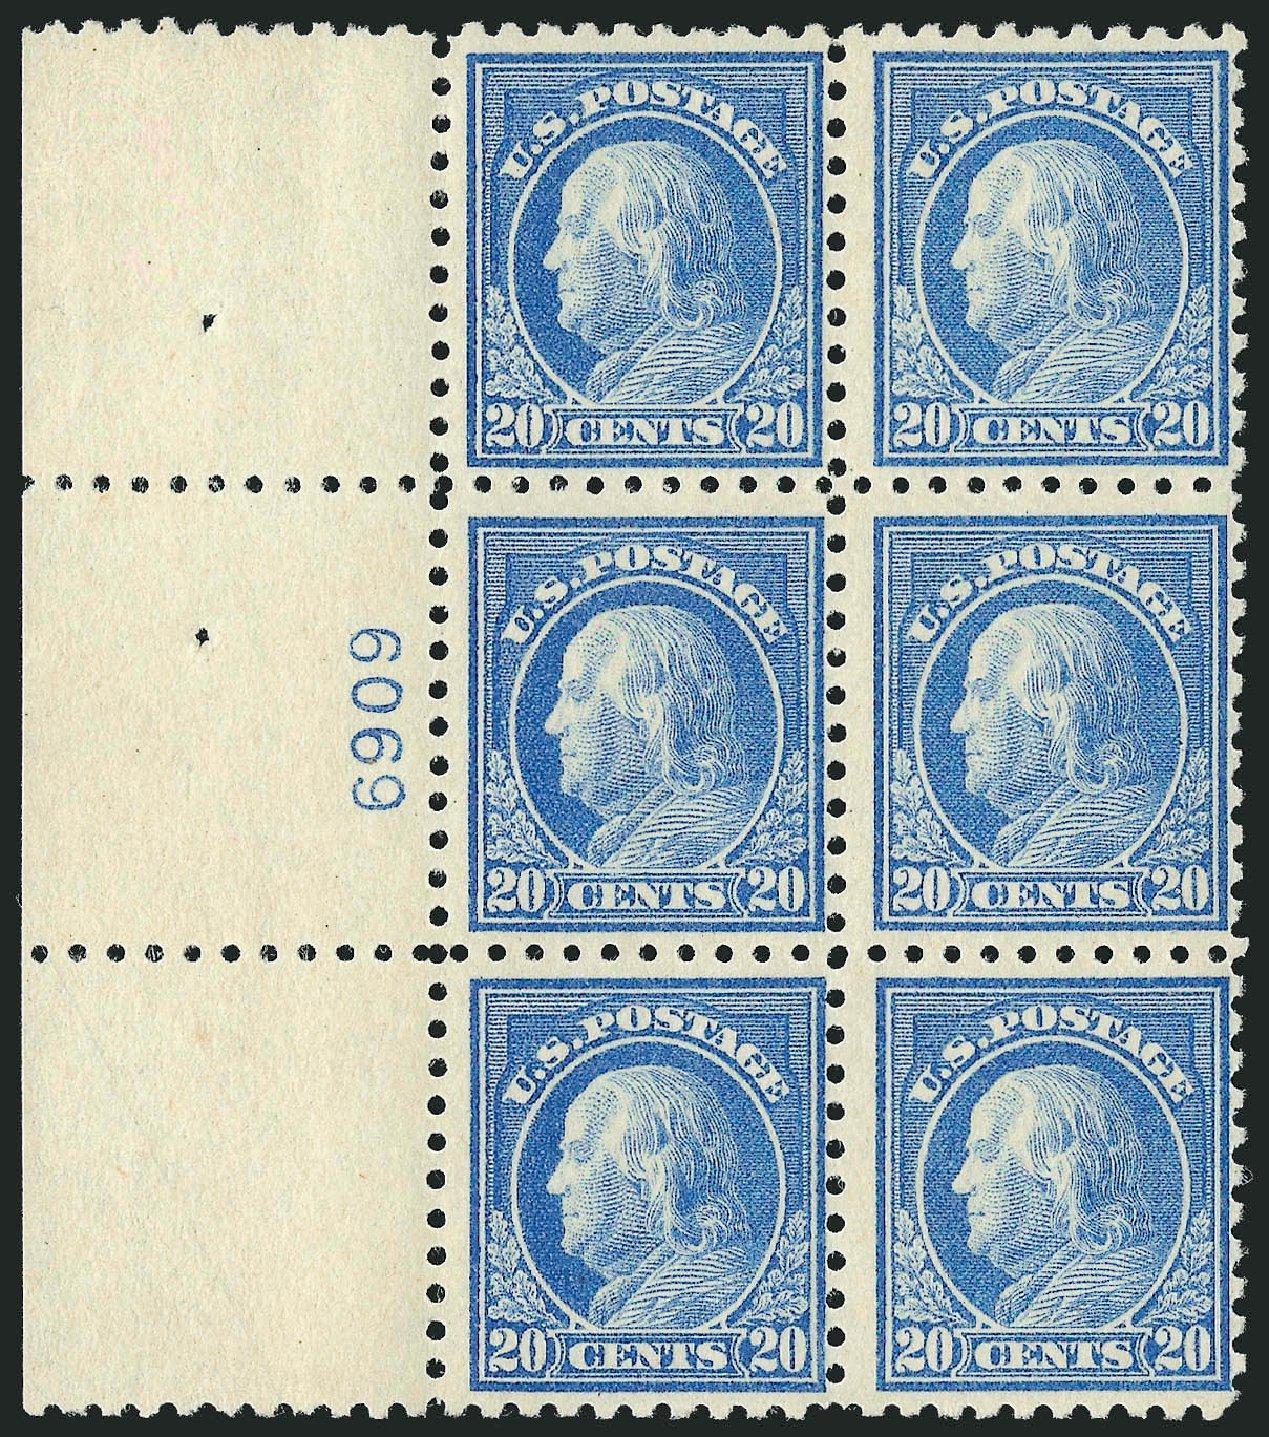 US Stamp Price Scott Cat. 476: 20c 1916 Franklin Perf 10. Robert Siegel Auction Galleries, Sep 2014, Sale 1078, Lot 550